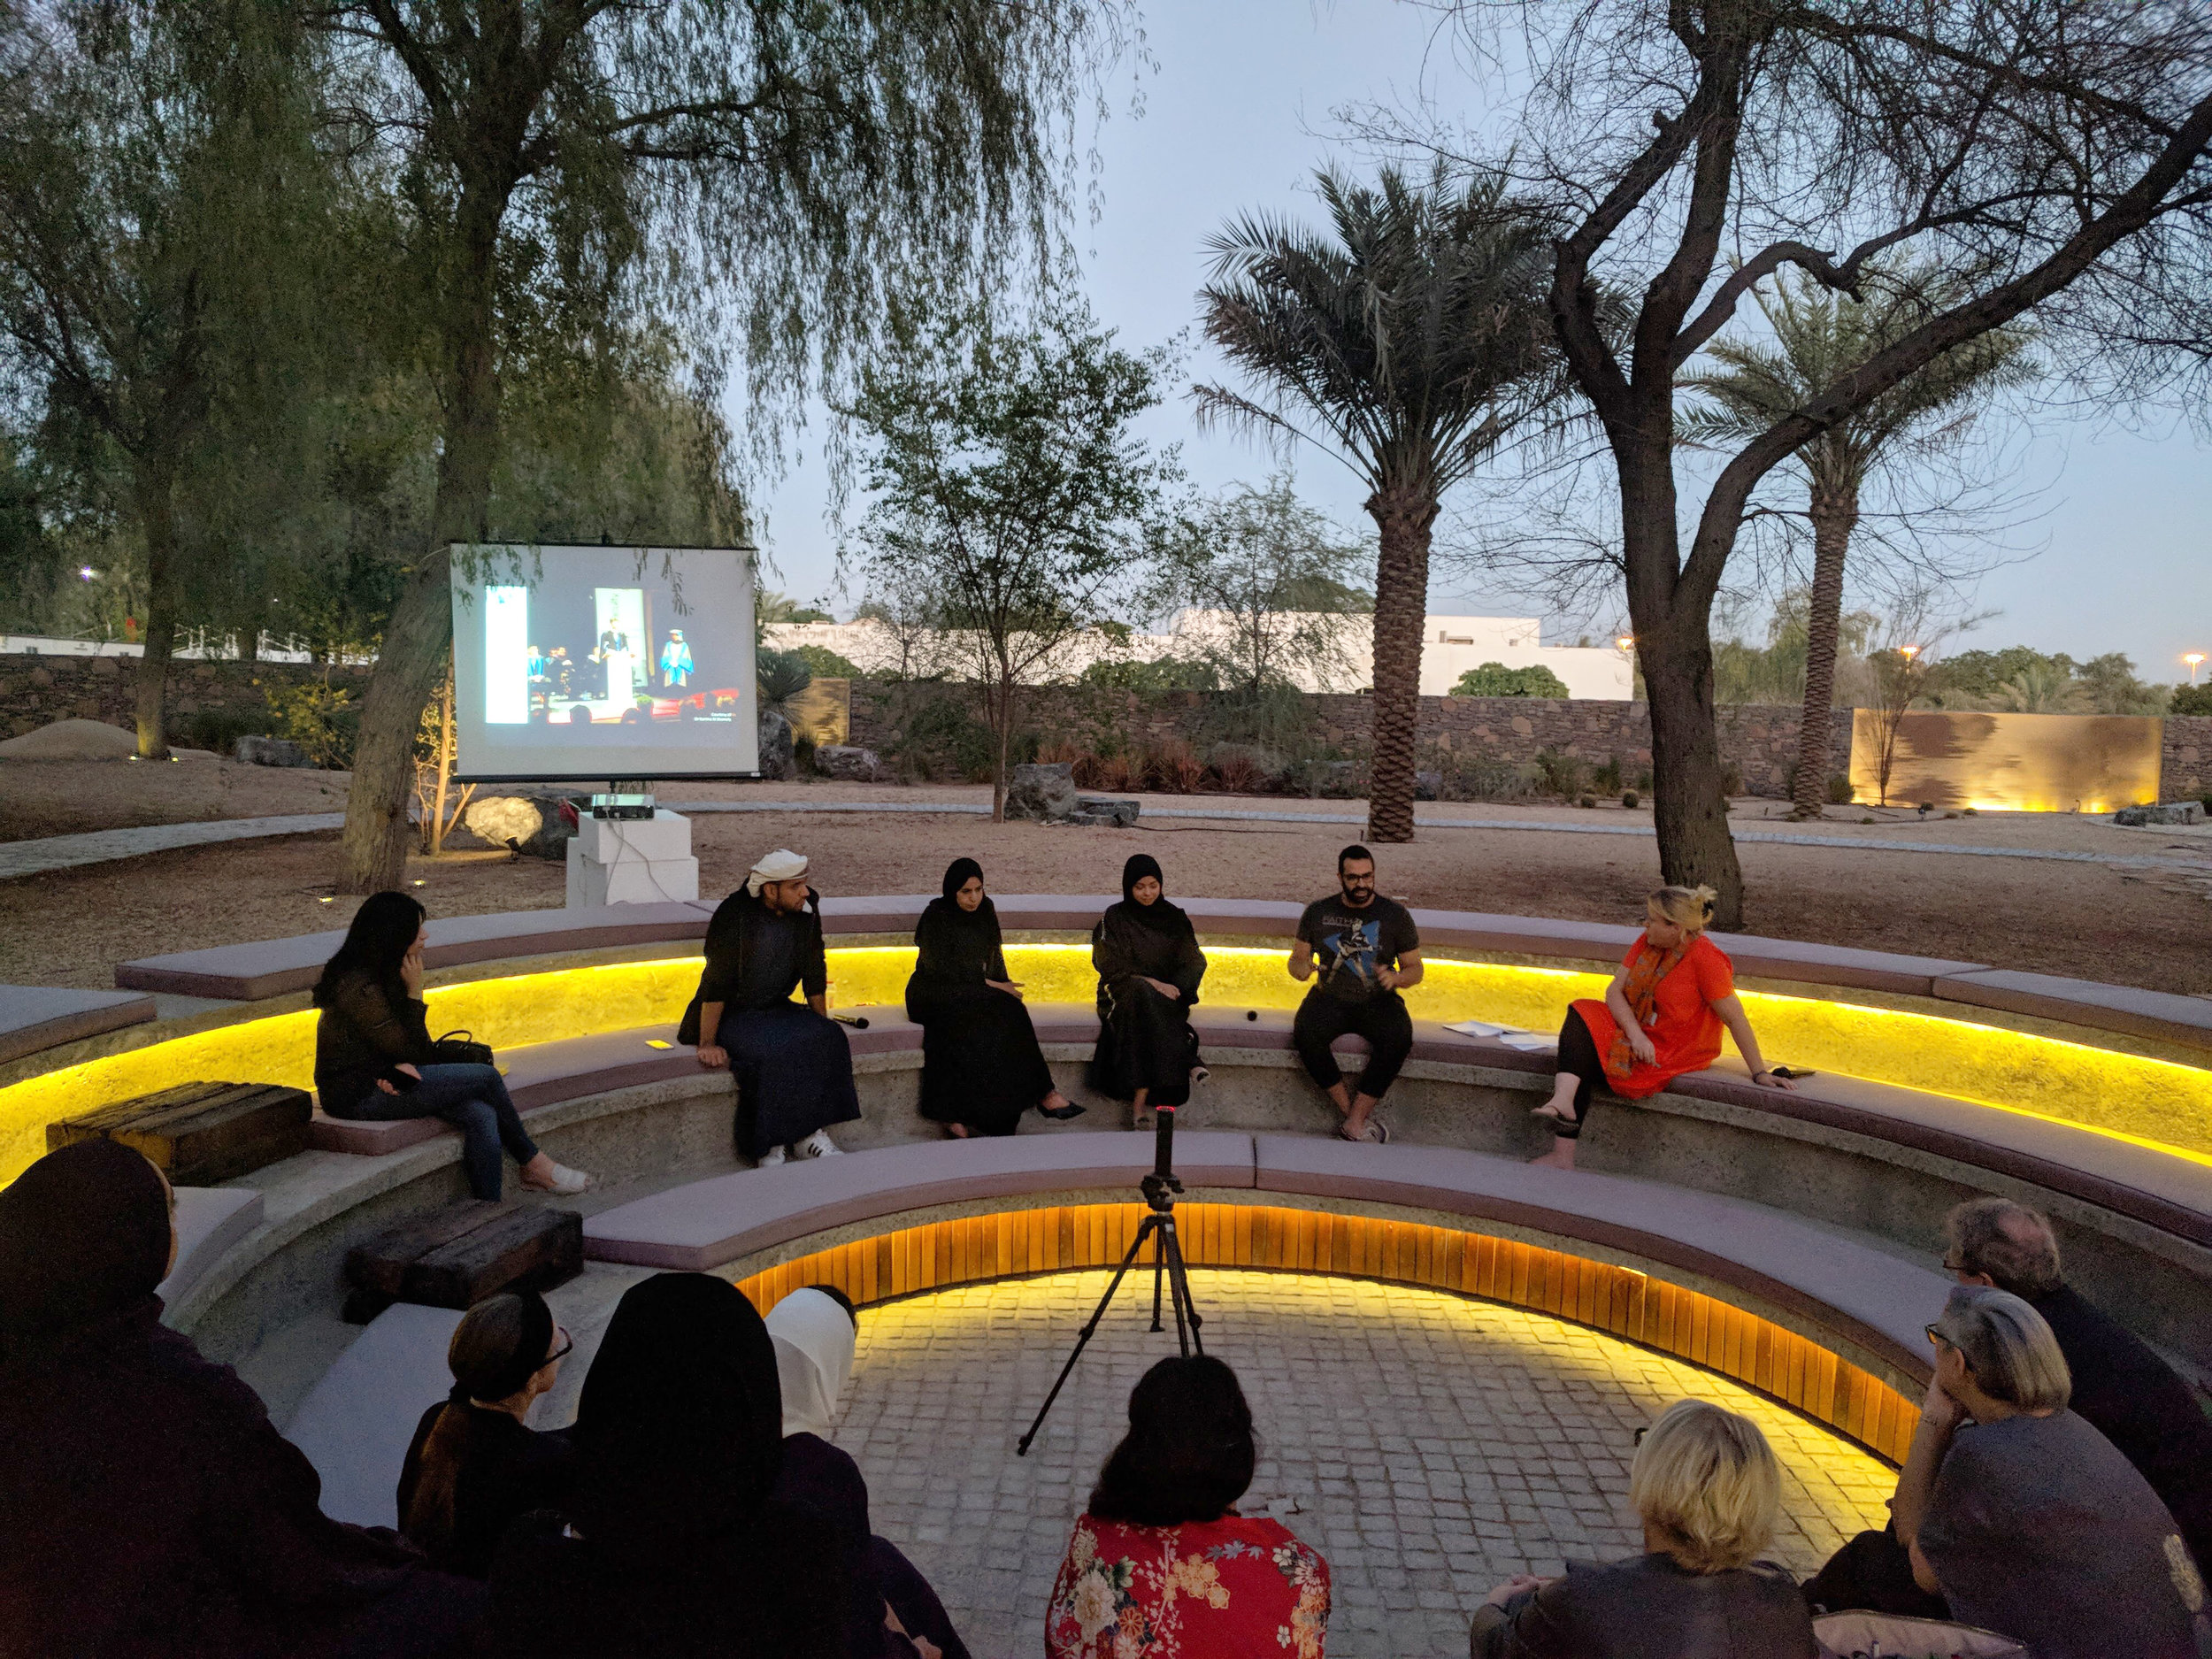 Tashkeel Talk with Saeed Al Madani, Dr. Karima Al Shomaly, Salama Nasib and Khalid Mezaina. Image courtesy of Tashkeel 3.jpg